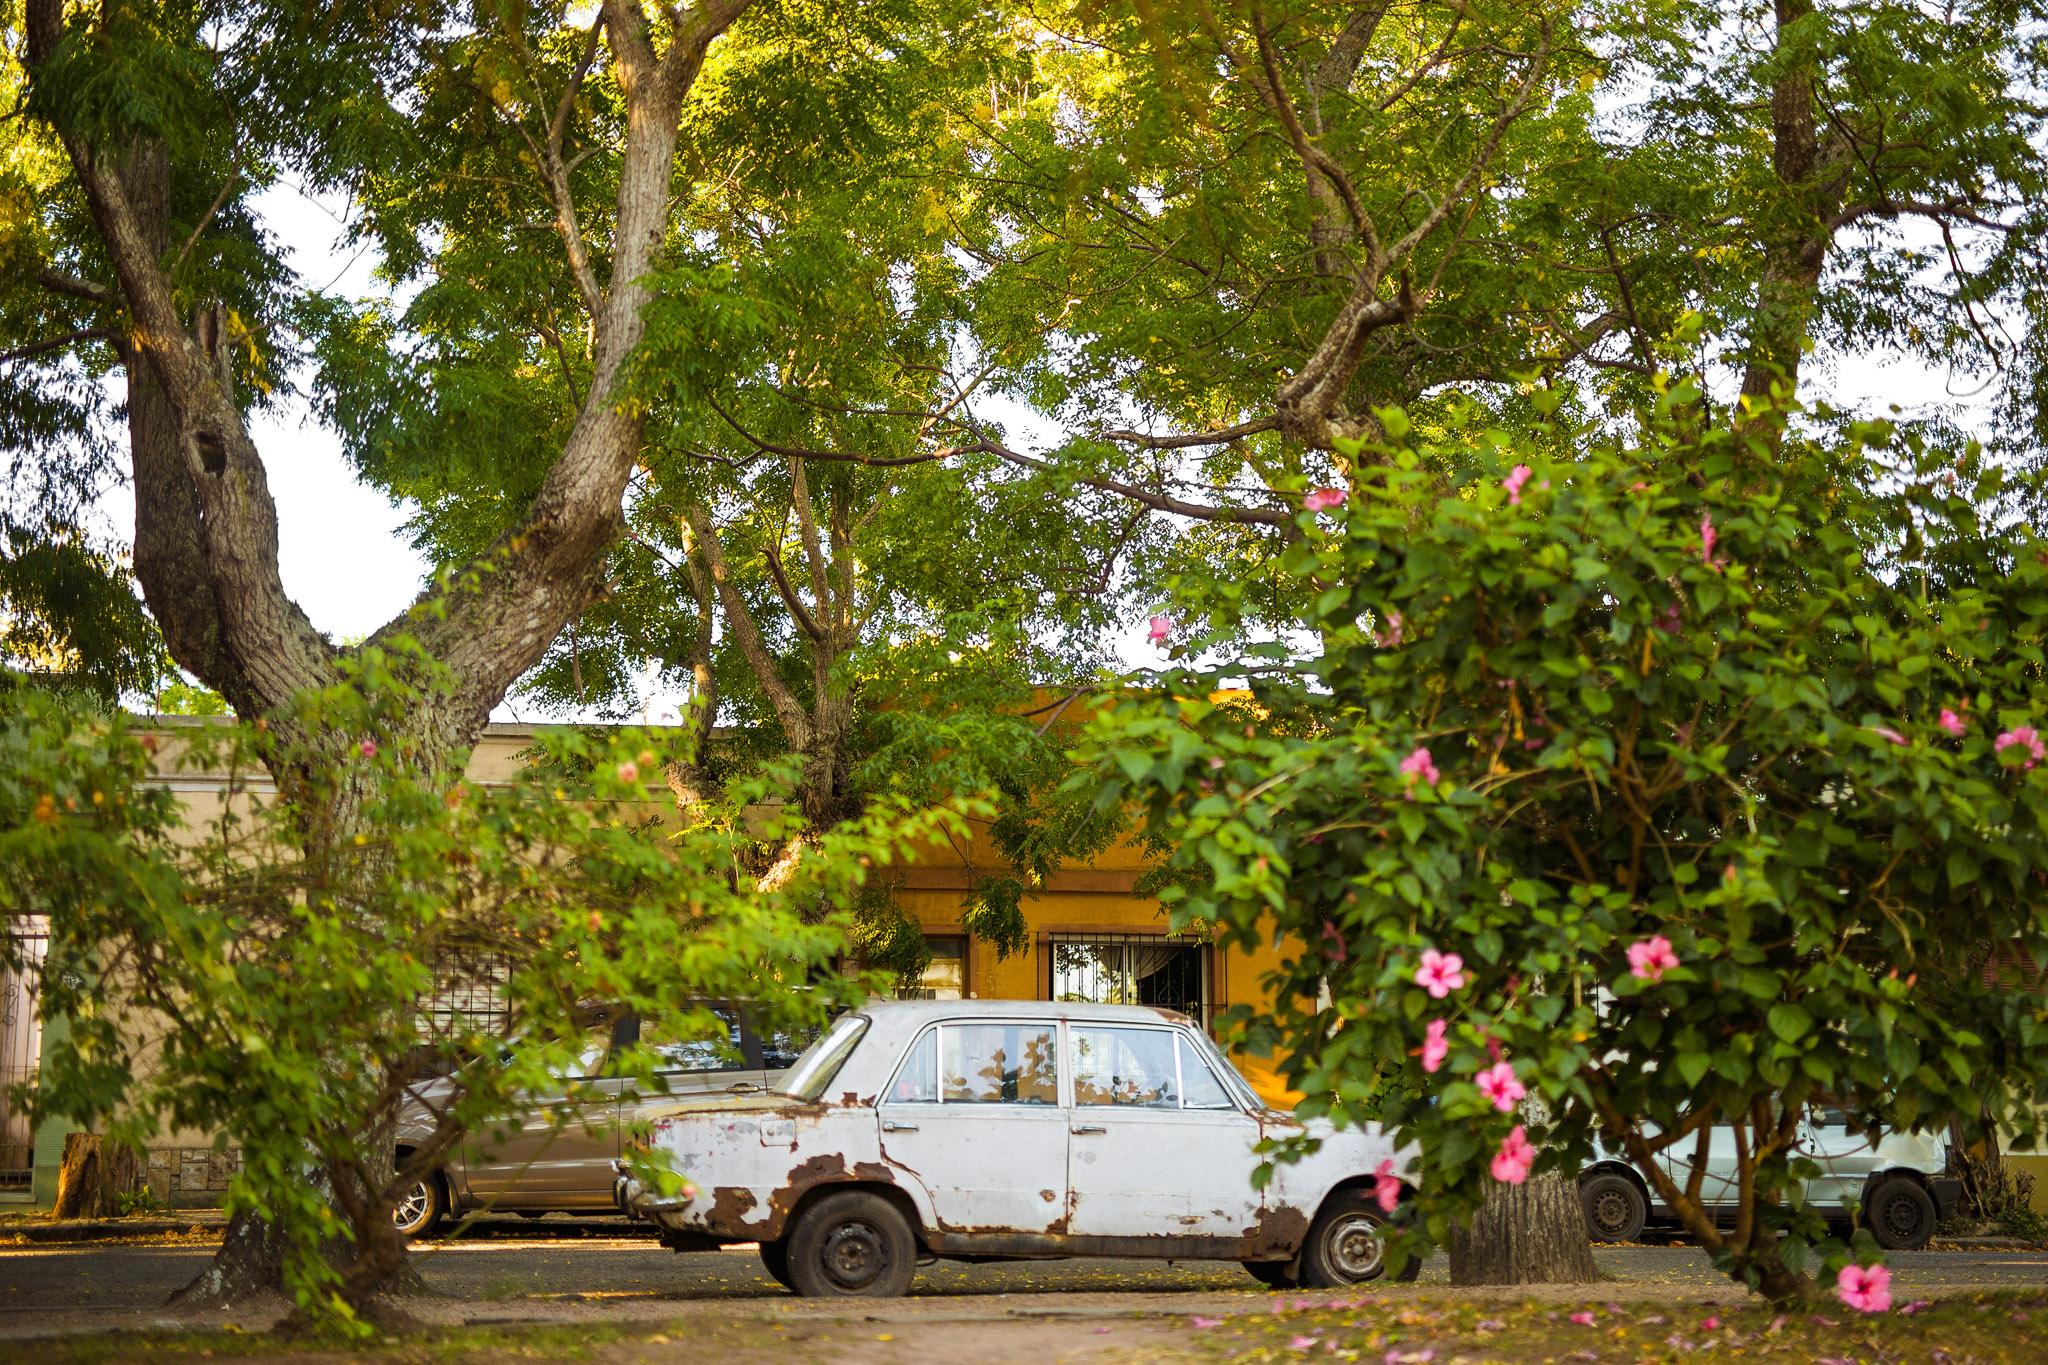 wedding-travellers-destination-photography-overlanding-south-america-uruguay-colonia-del-sacramento-old-rust-car